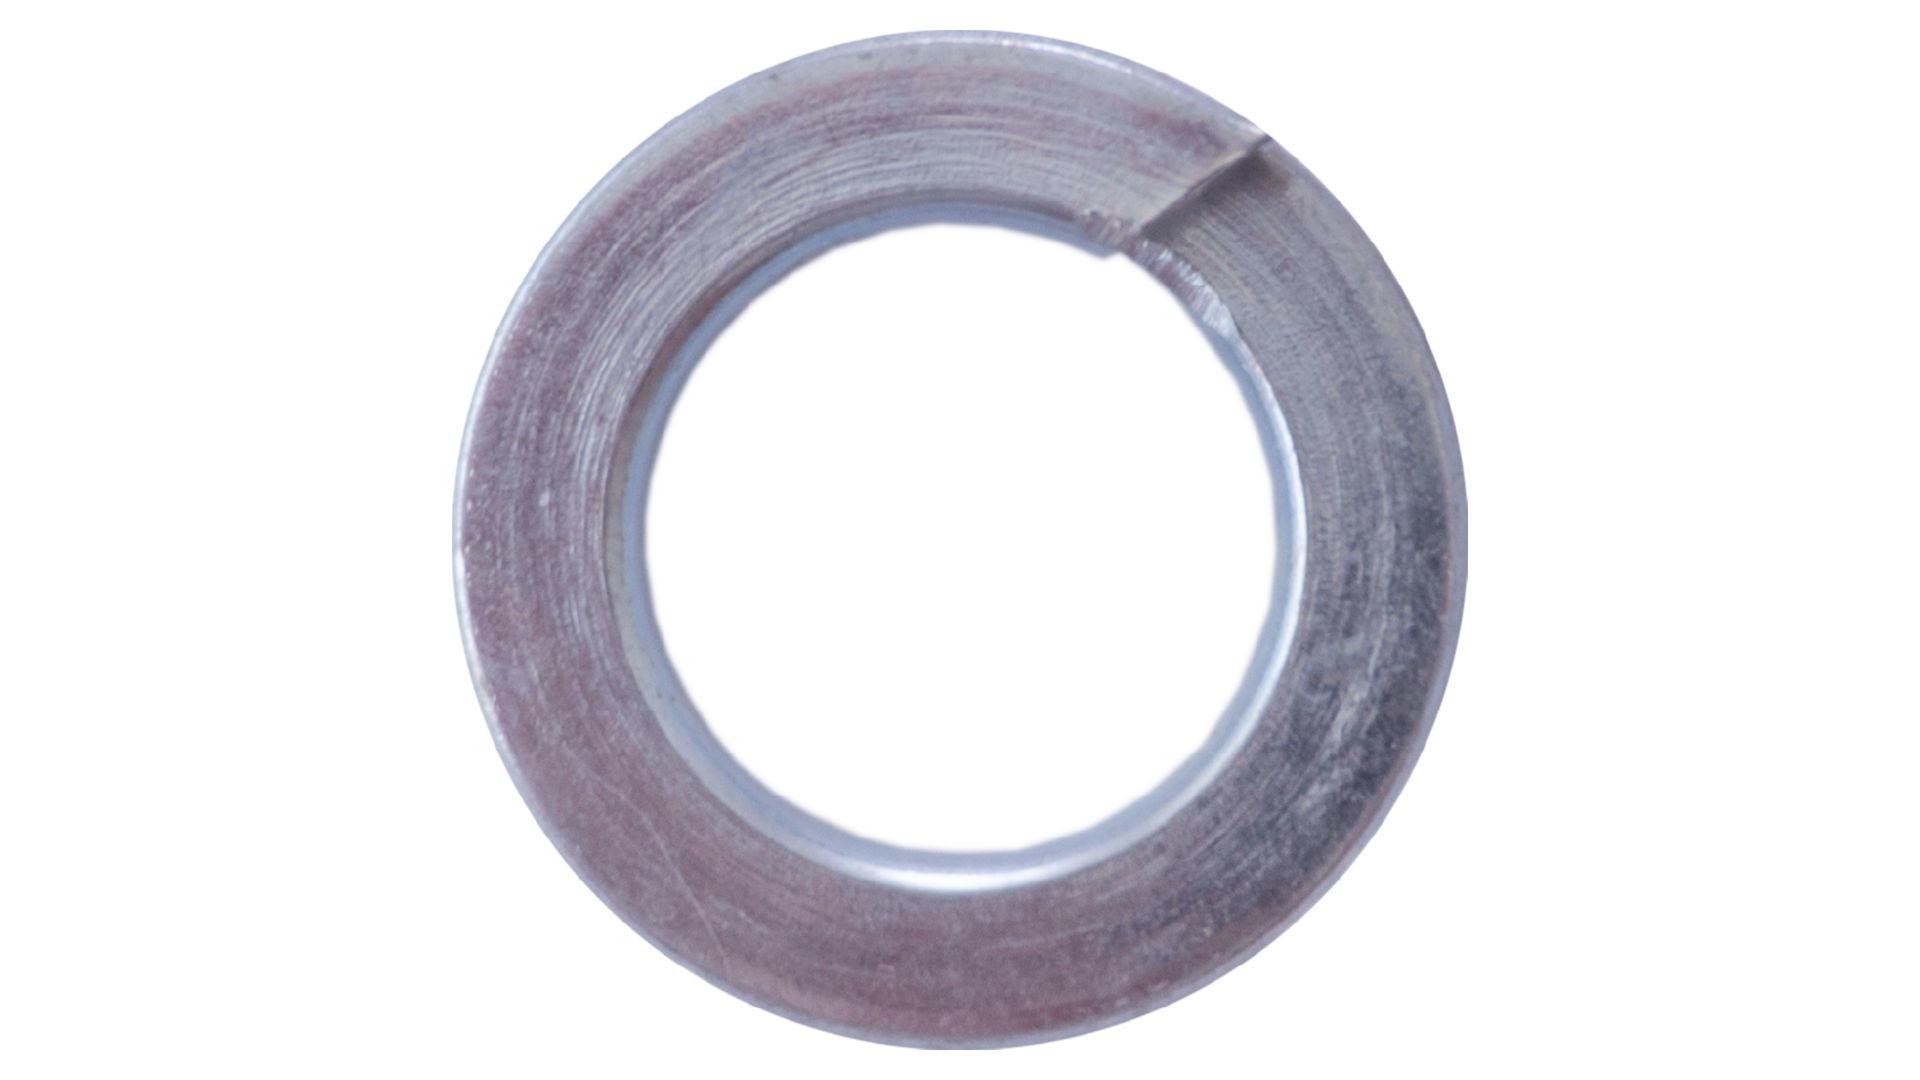 Шайба пружинная Apro - М12 DIN 127 (100 шт.) 4